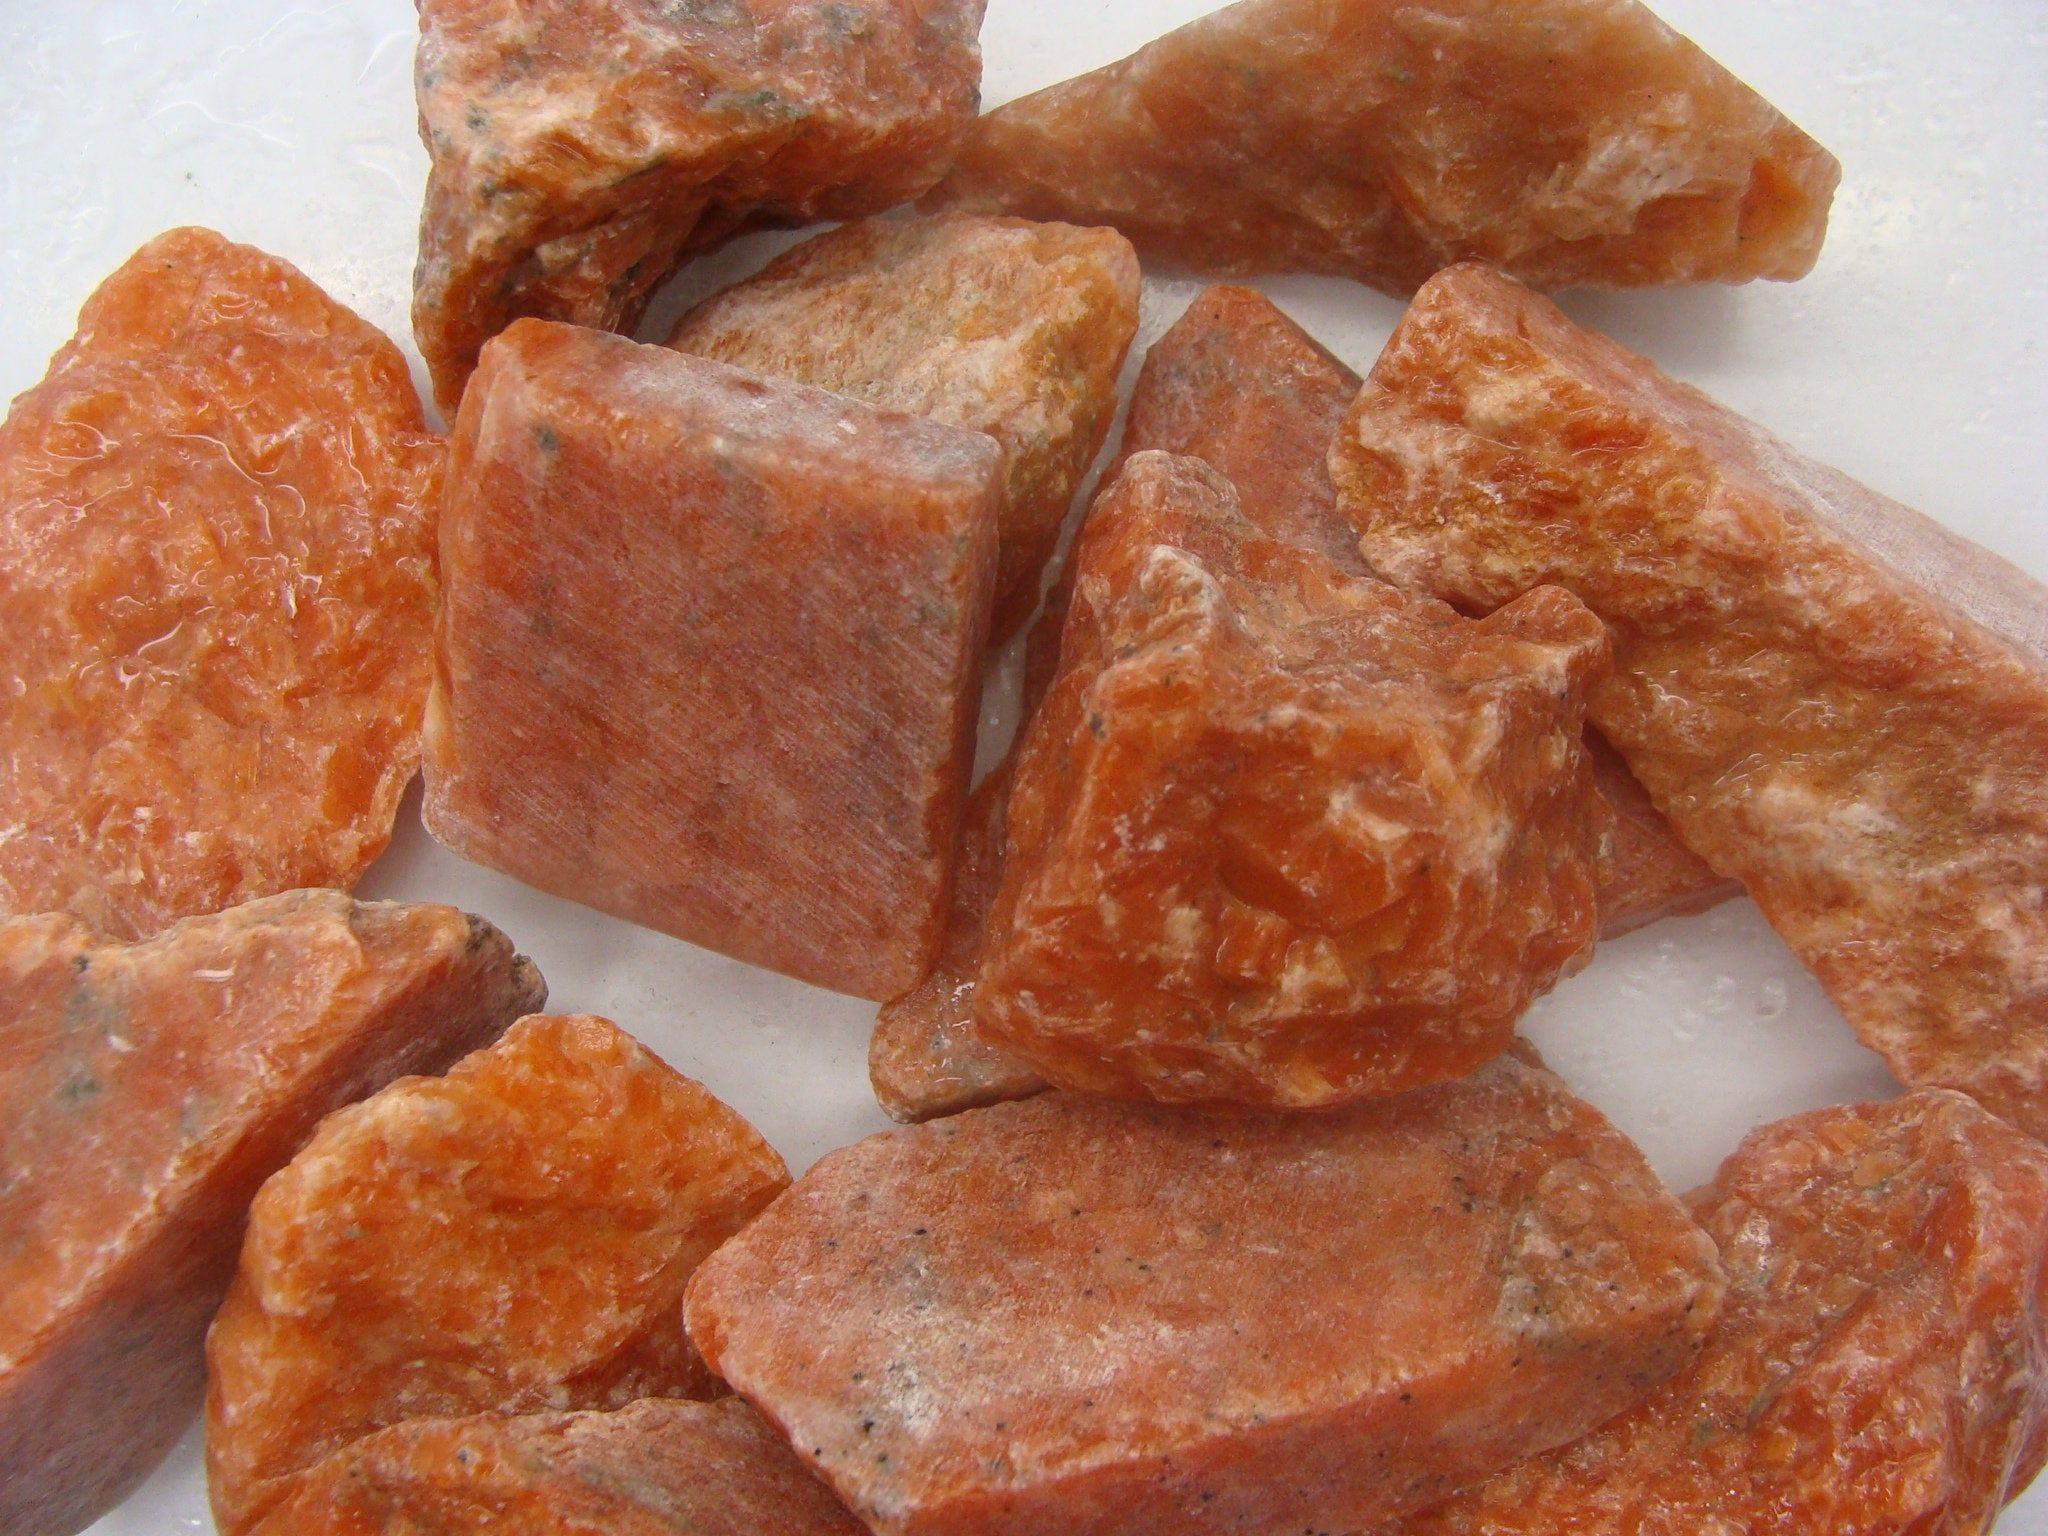 Mookaite 1 Pound 1lb Bulk Lot lb 2 to 2.5 inch pieces Tumbled